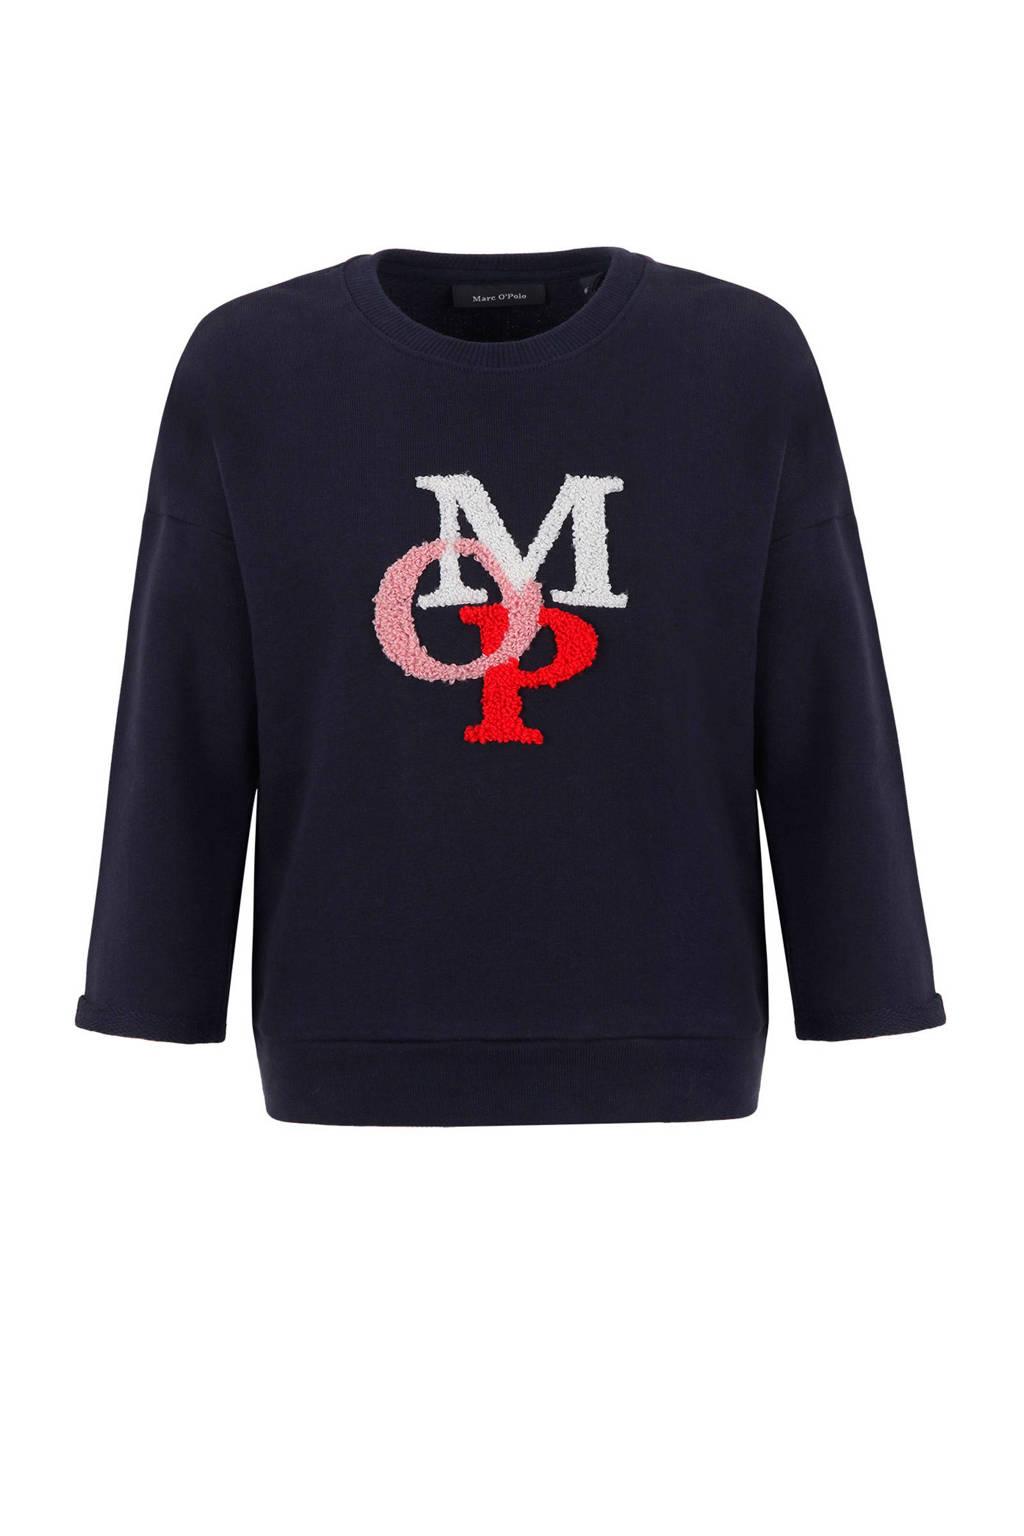 Marc O'Polo sweater met logo blauw, Donkerblauw